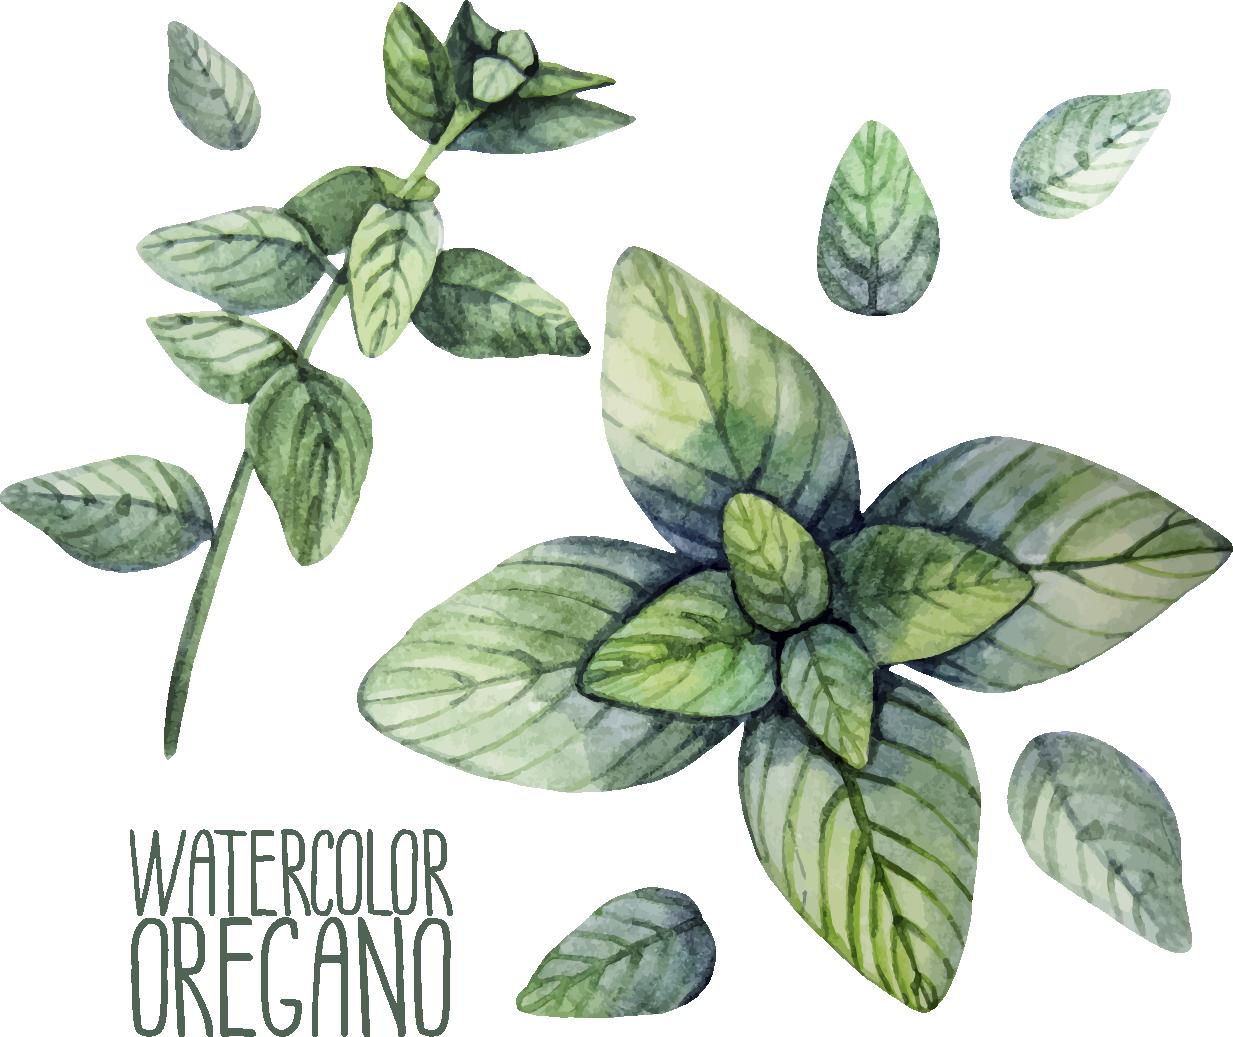 svg freeuse download Herb oregano watercolor painting. Basil drawing botanical illustration.